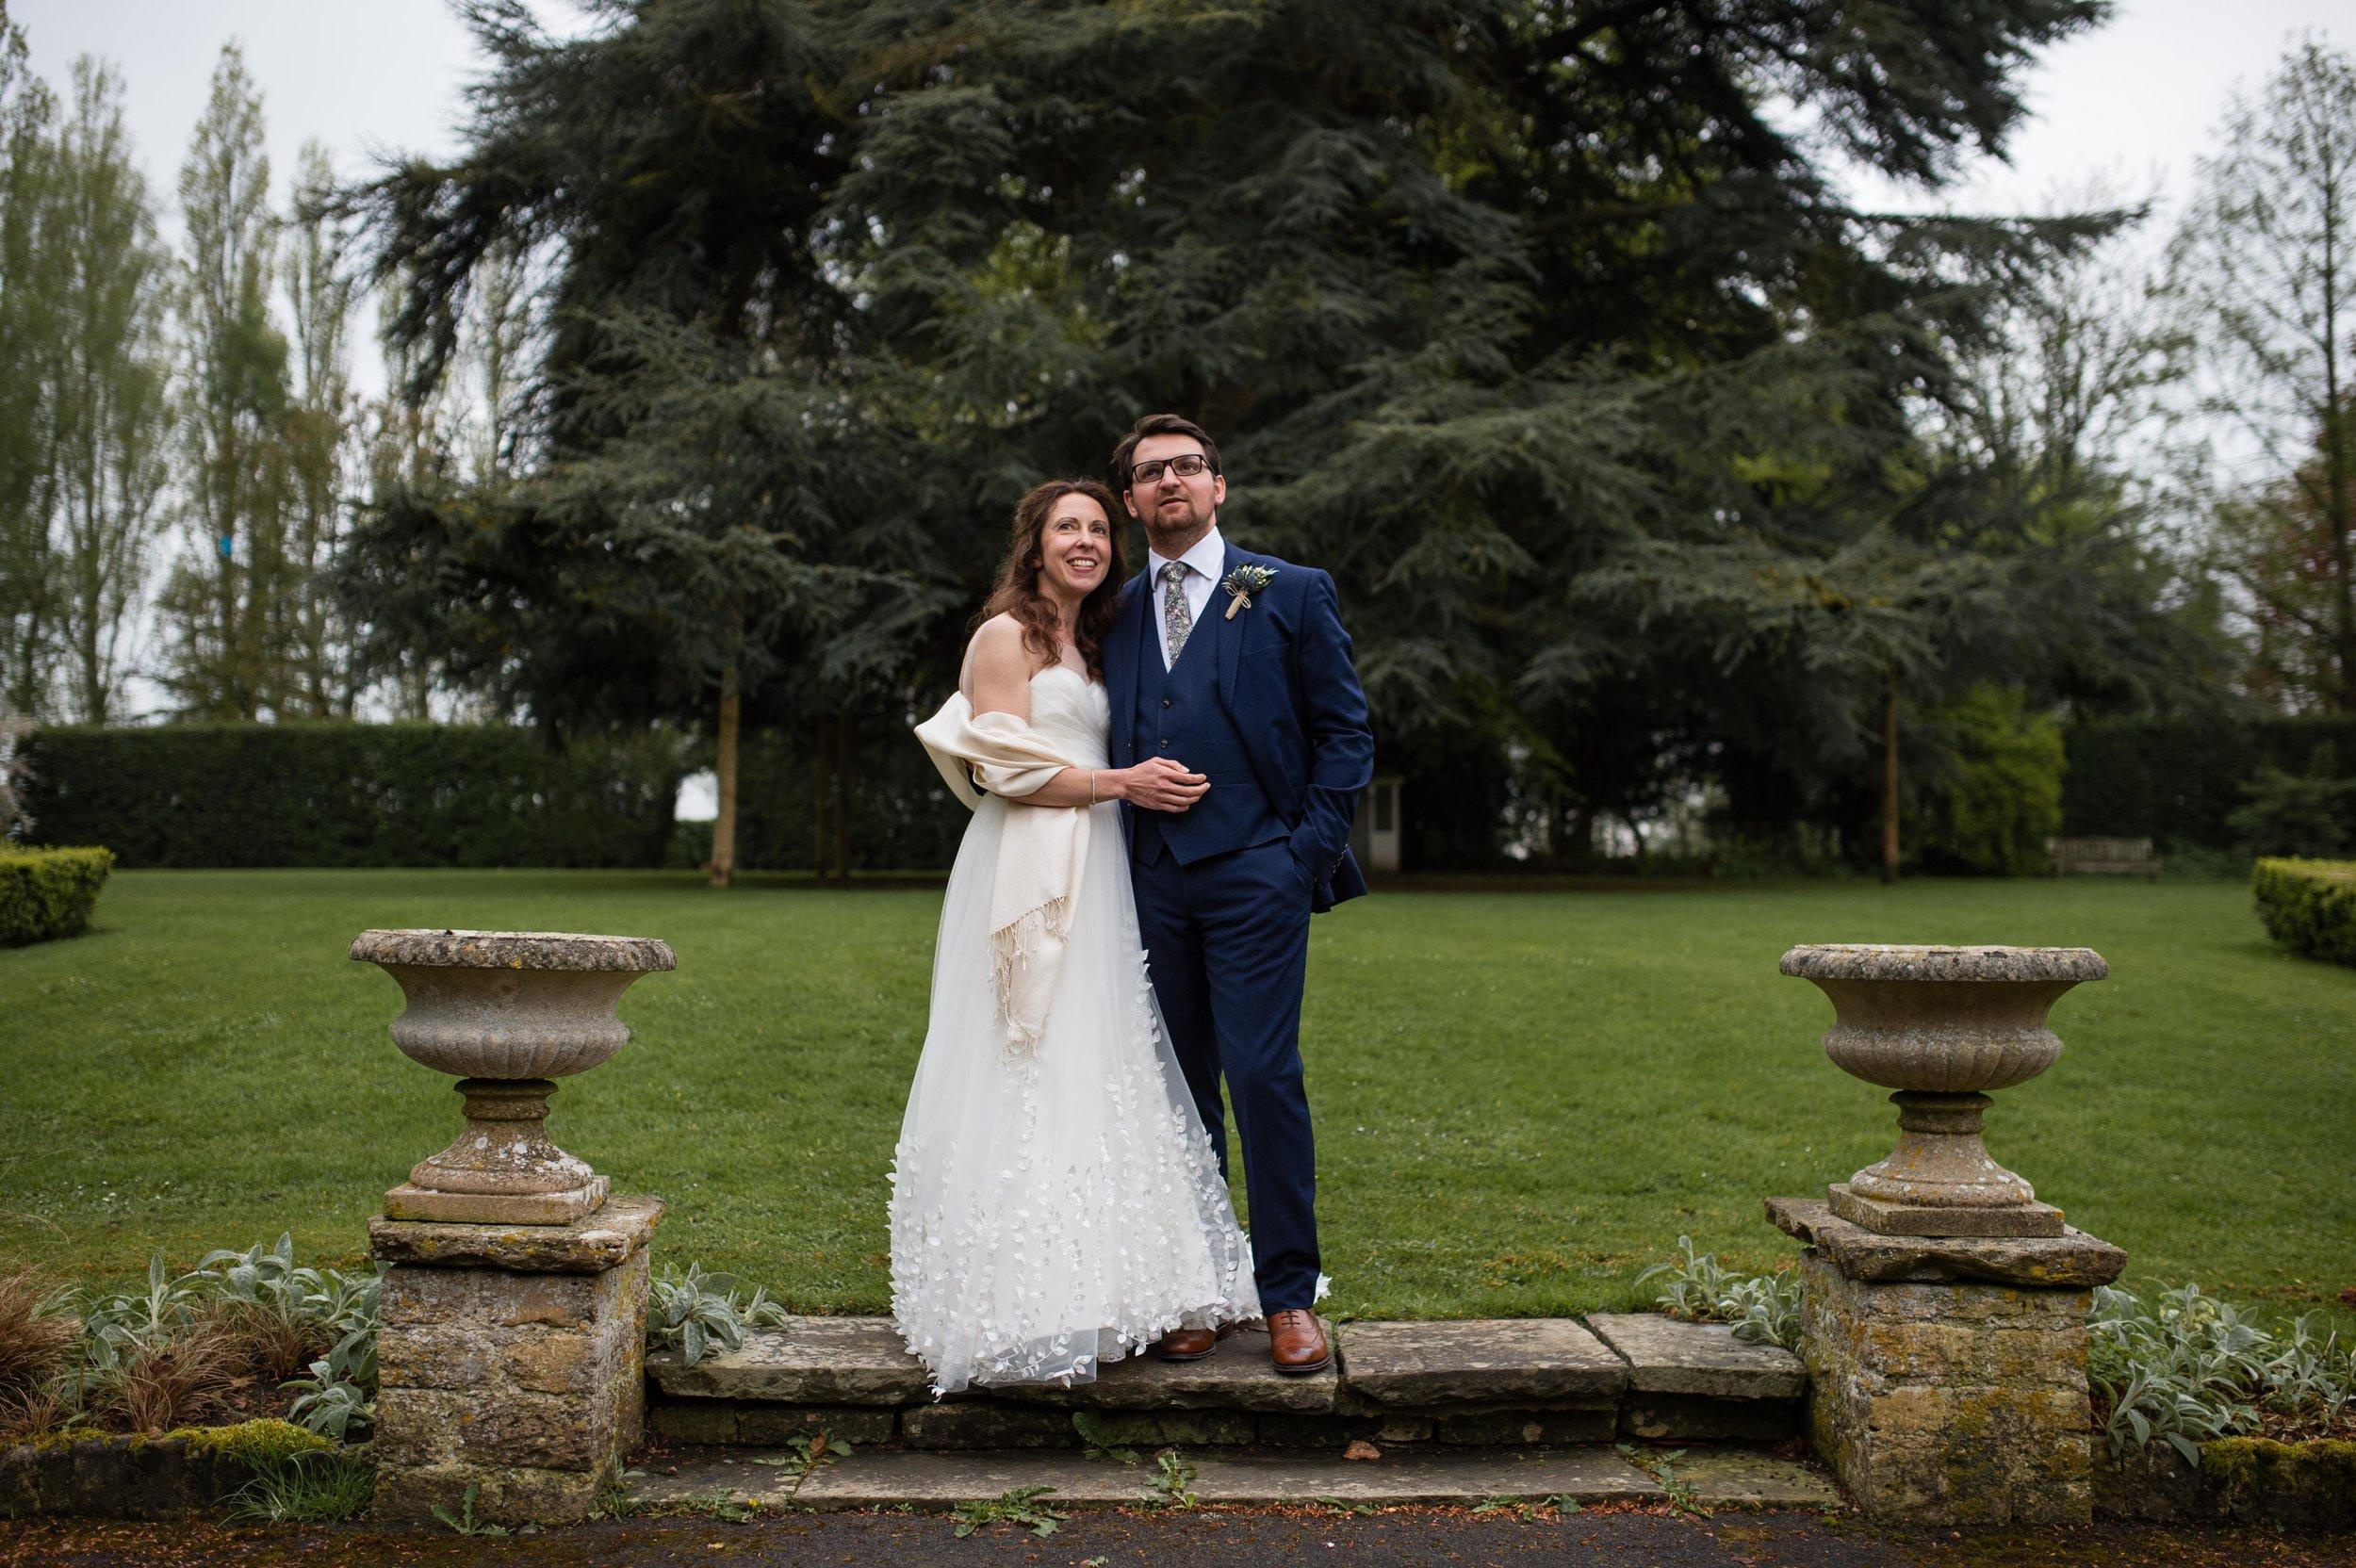 Beechfield house weddings - Abby and Greg (183 of 208).jpg